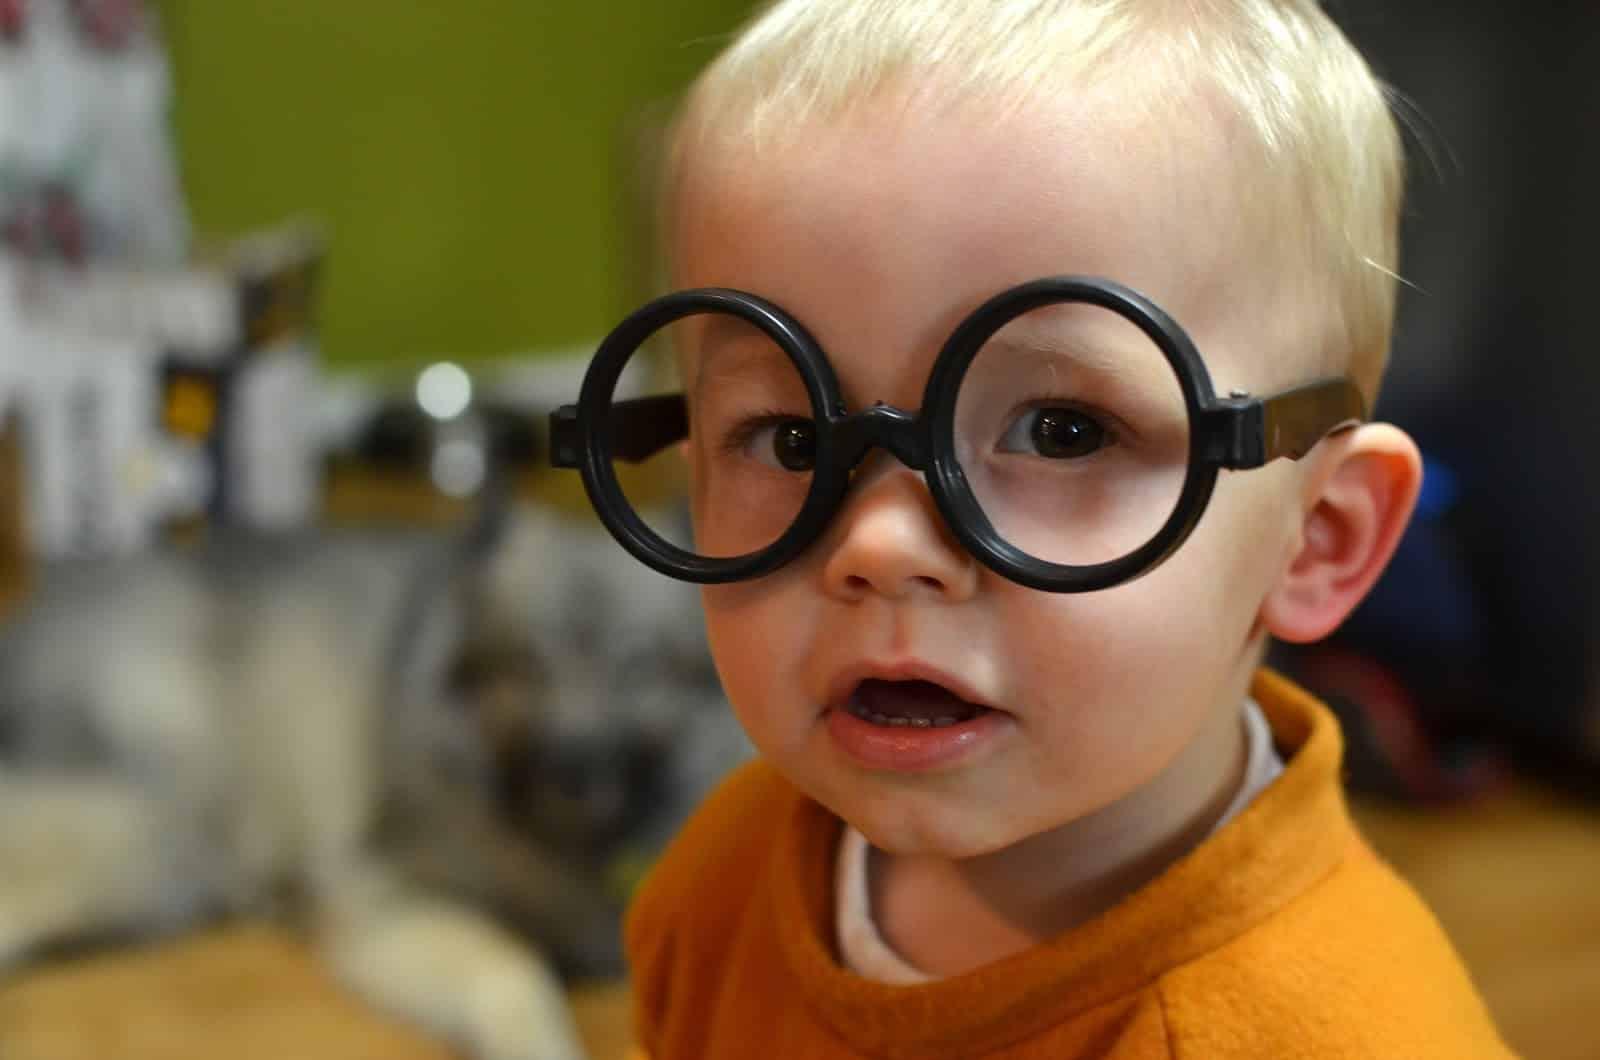 У ребенка группа риска по близорукости thumbnail